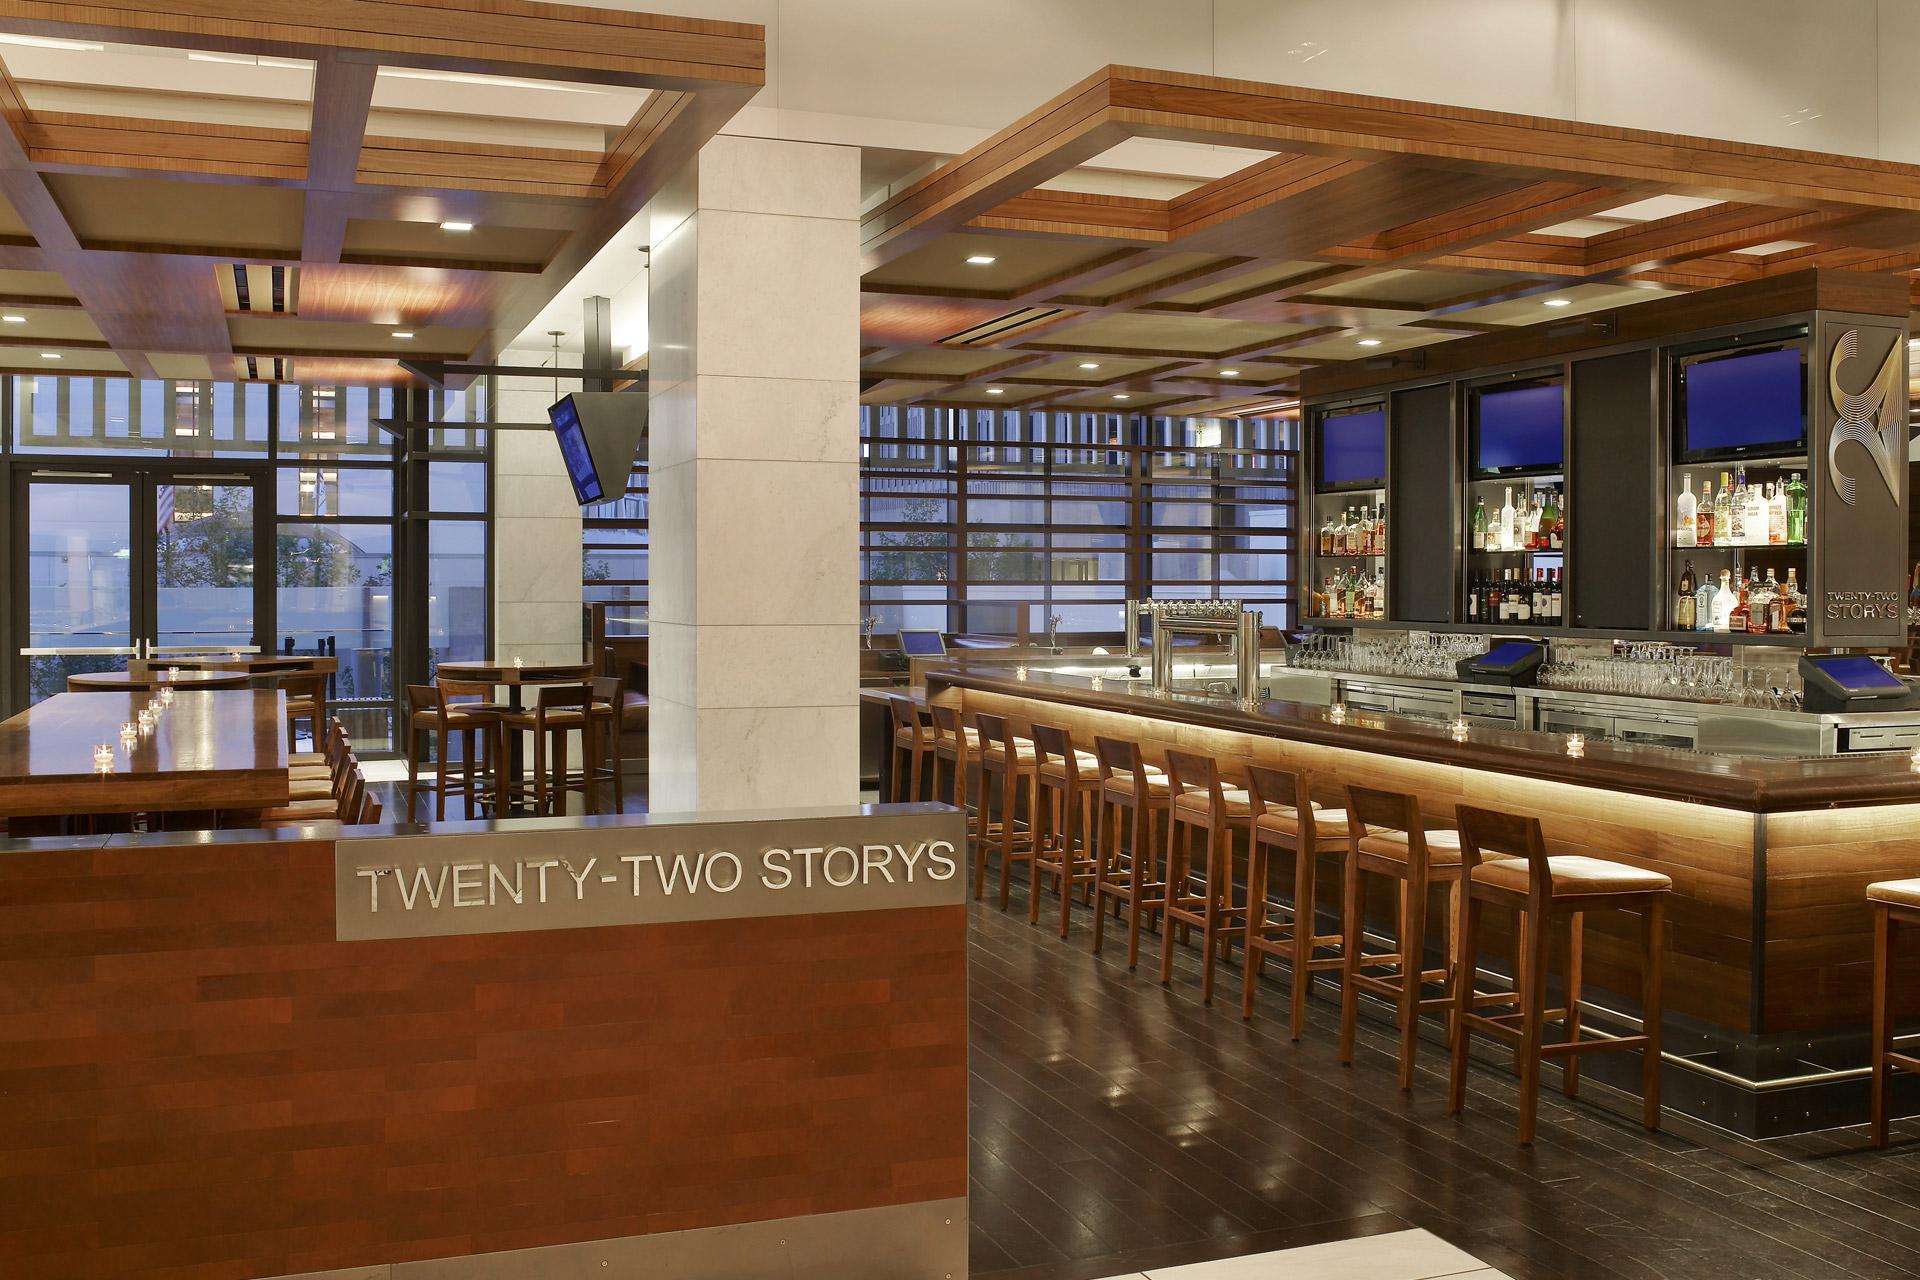 Twenty Two Storys & Market restaurant designer